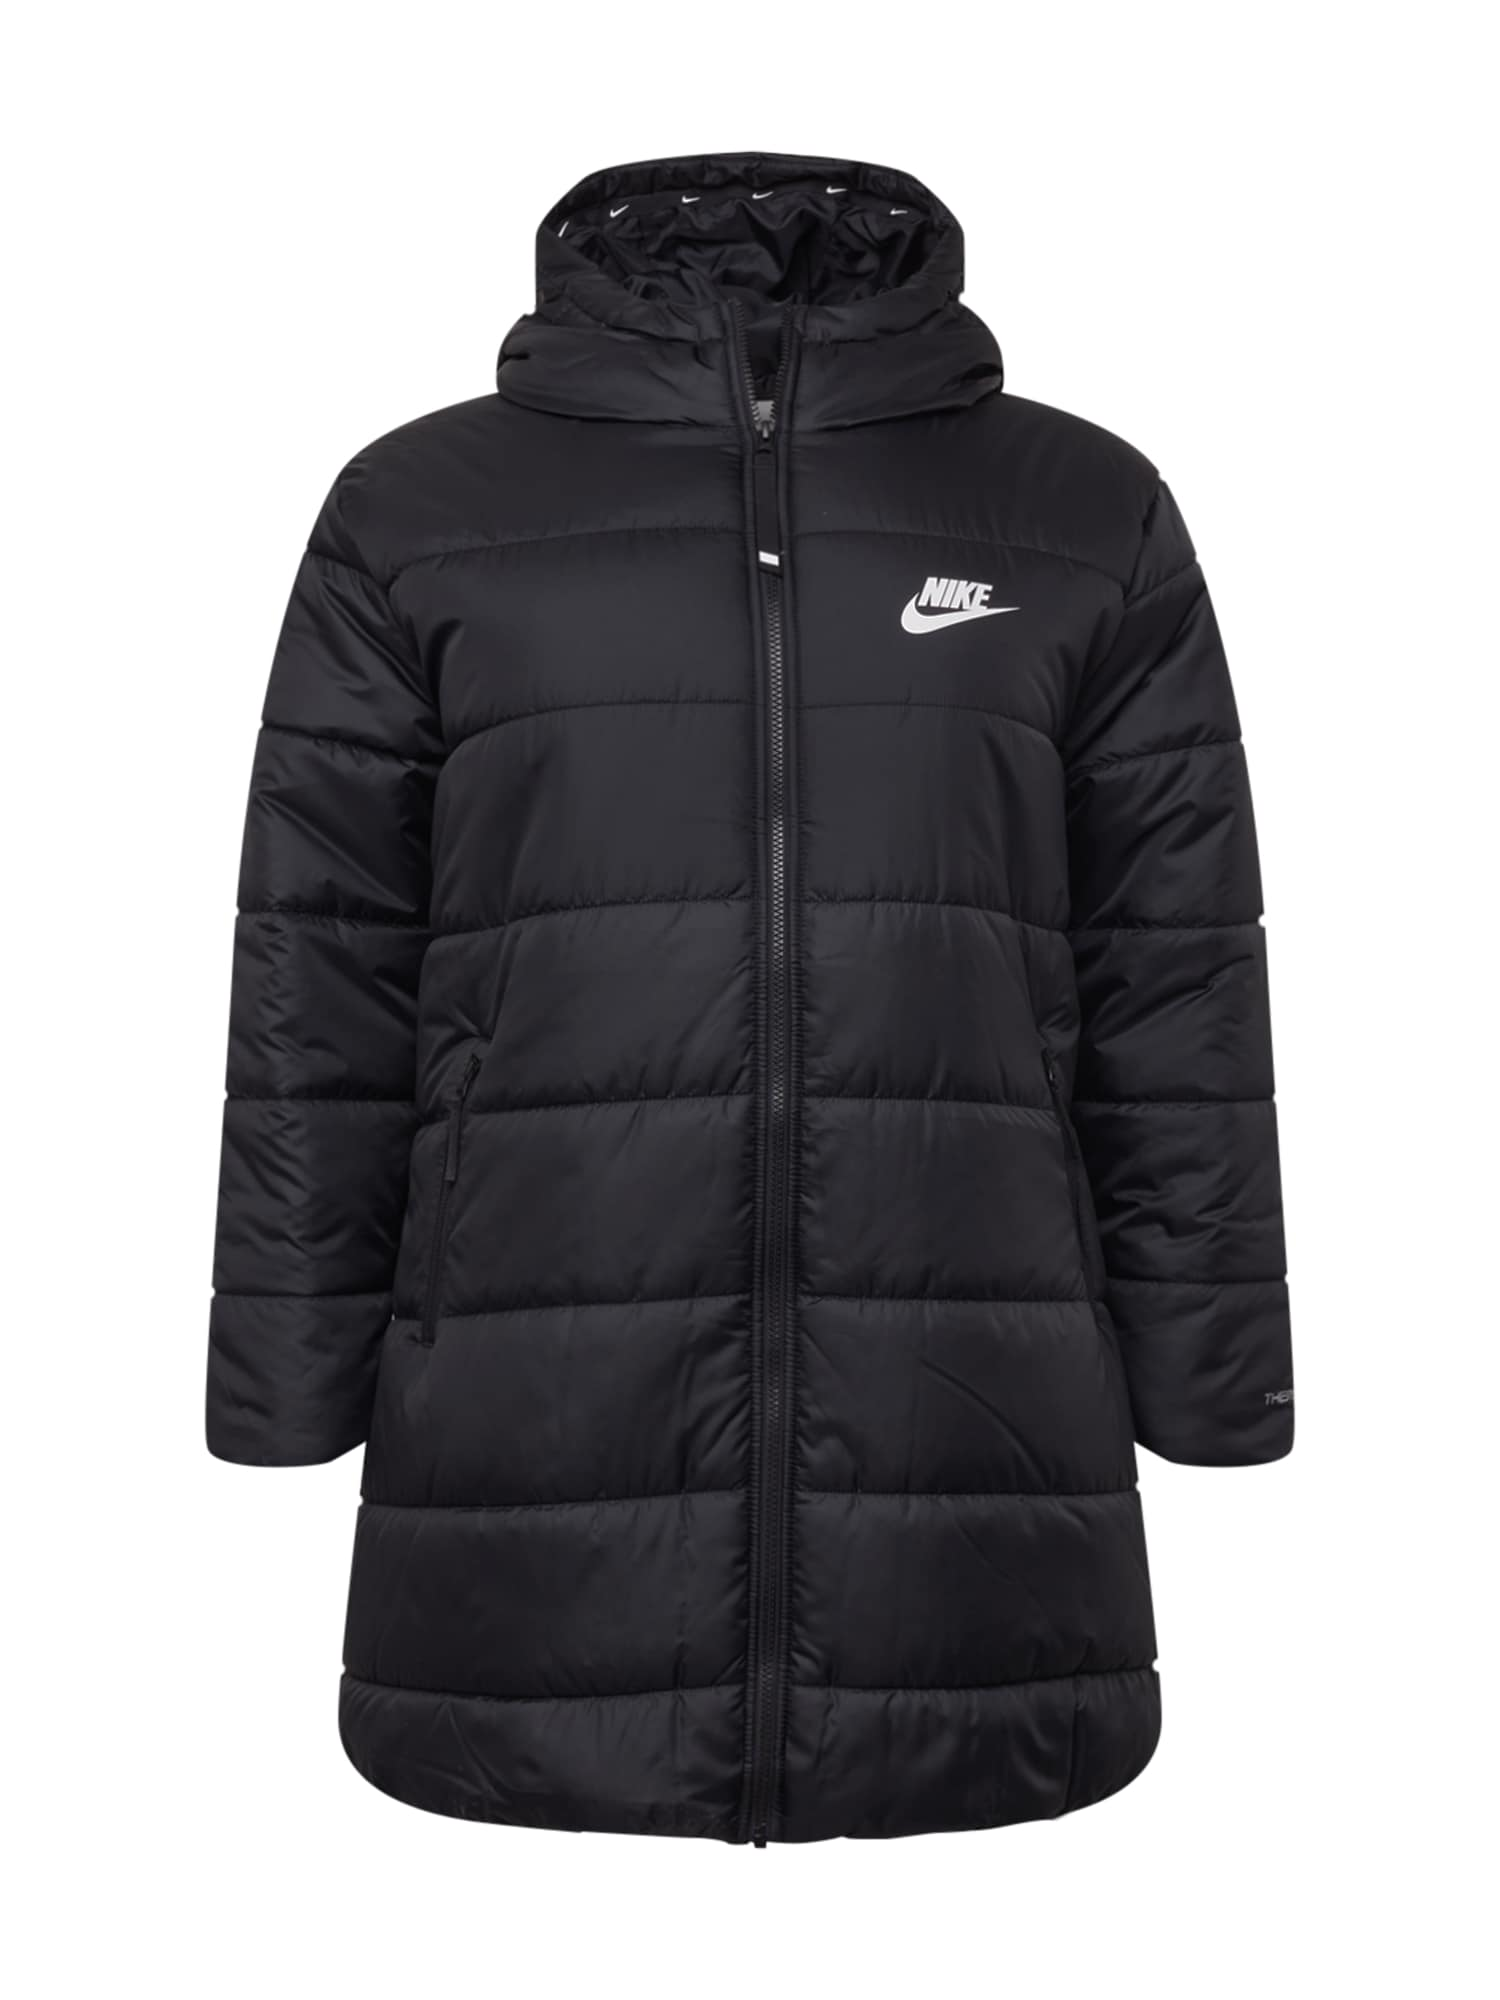 Nike Sportswear Demisezoninis paltas juoda / balta